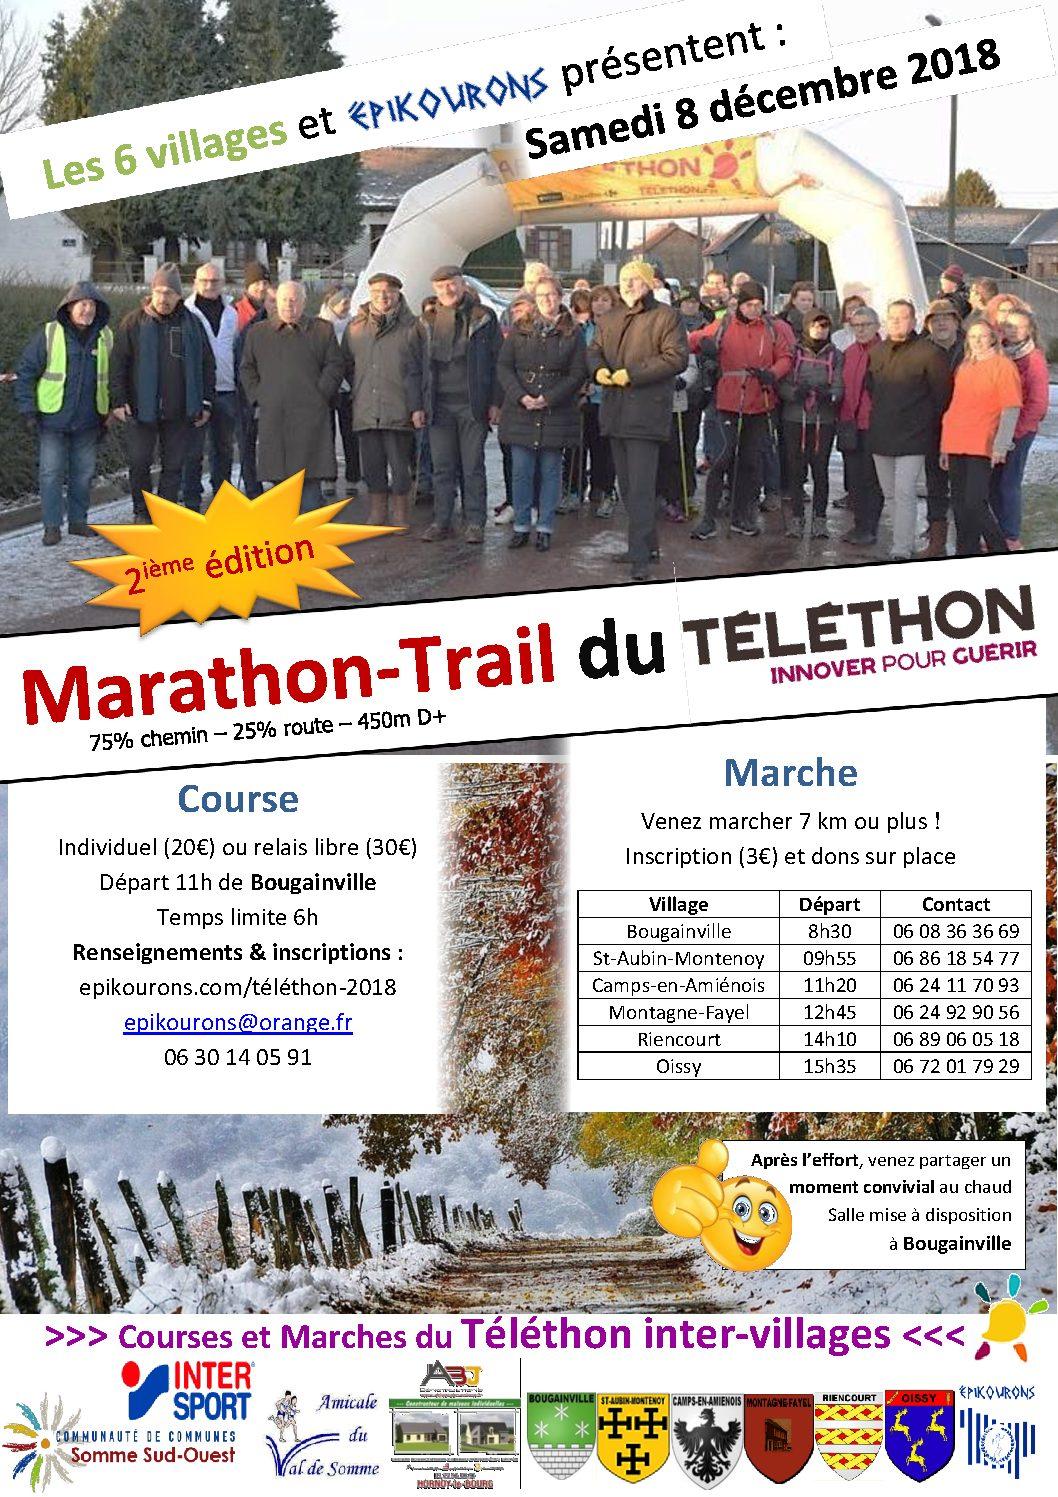 MARATHON-TRAIL du téléthon : Innover pour guérir